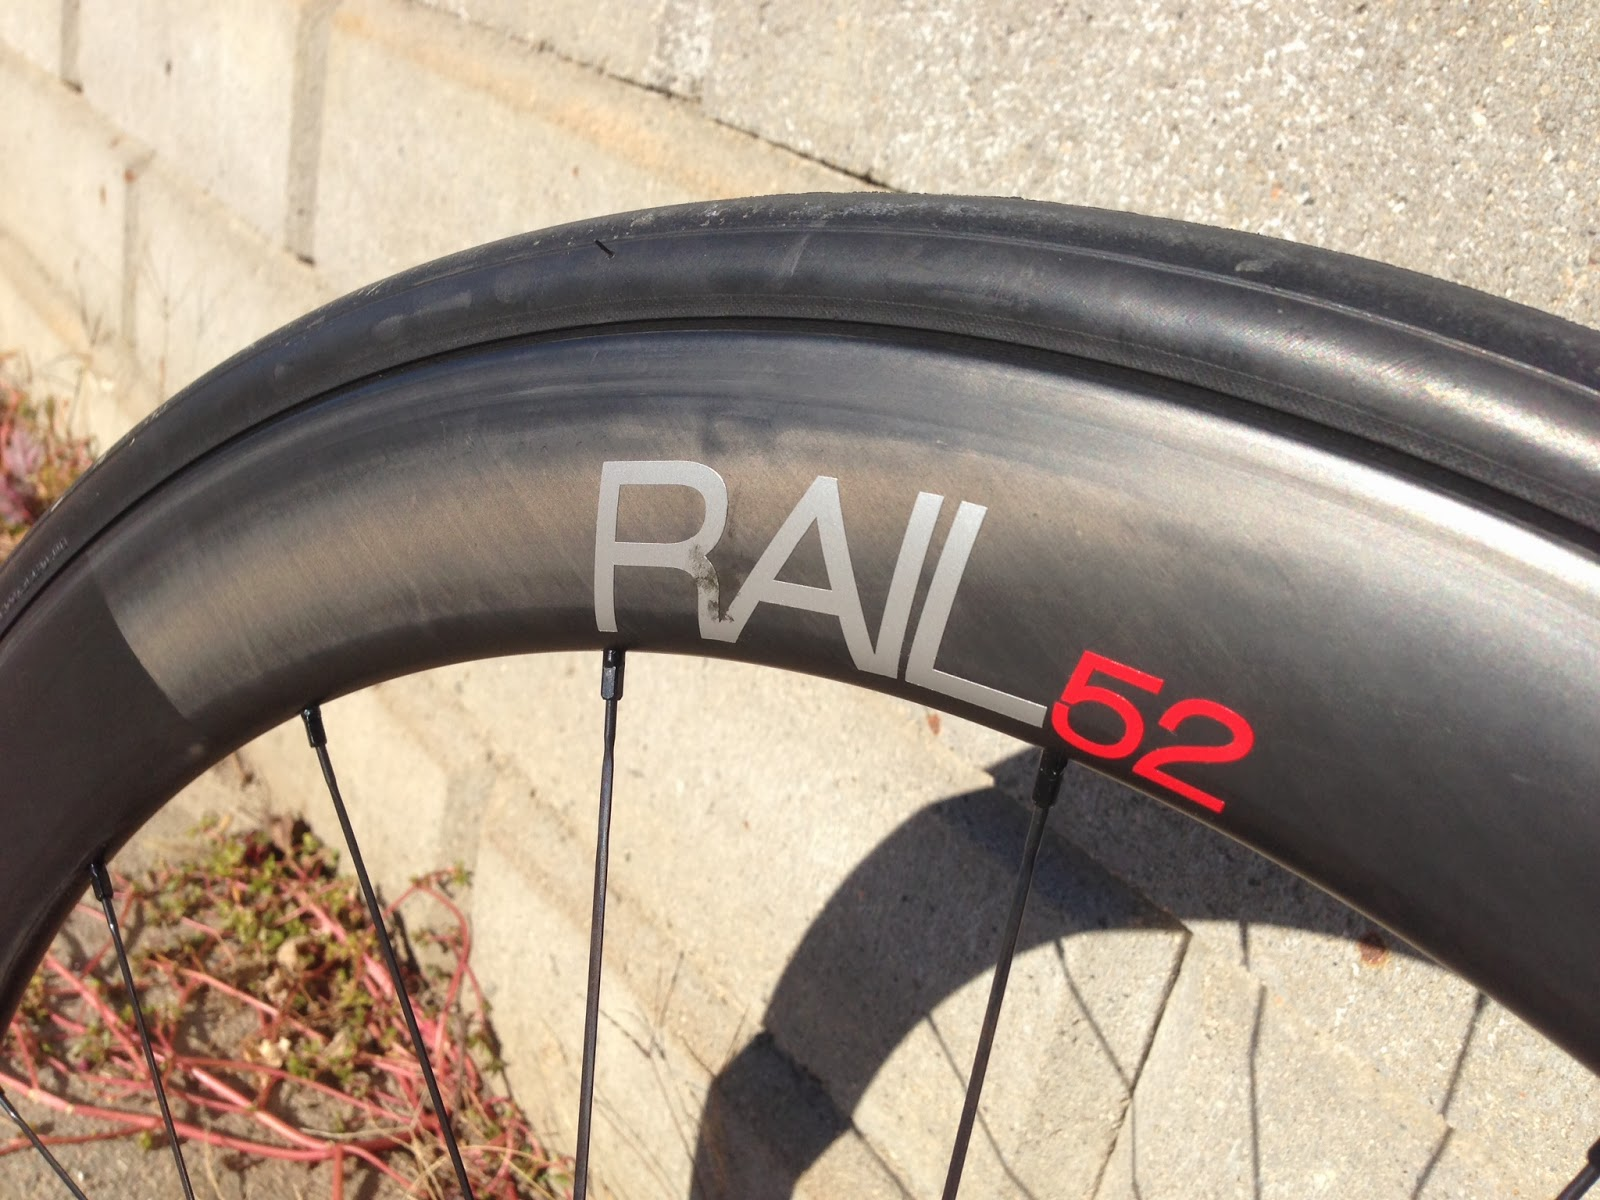 Review November Rail 52 Carbon Clincher Wheelset Average Cyclist